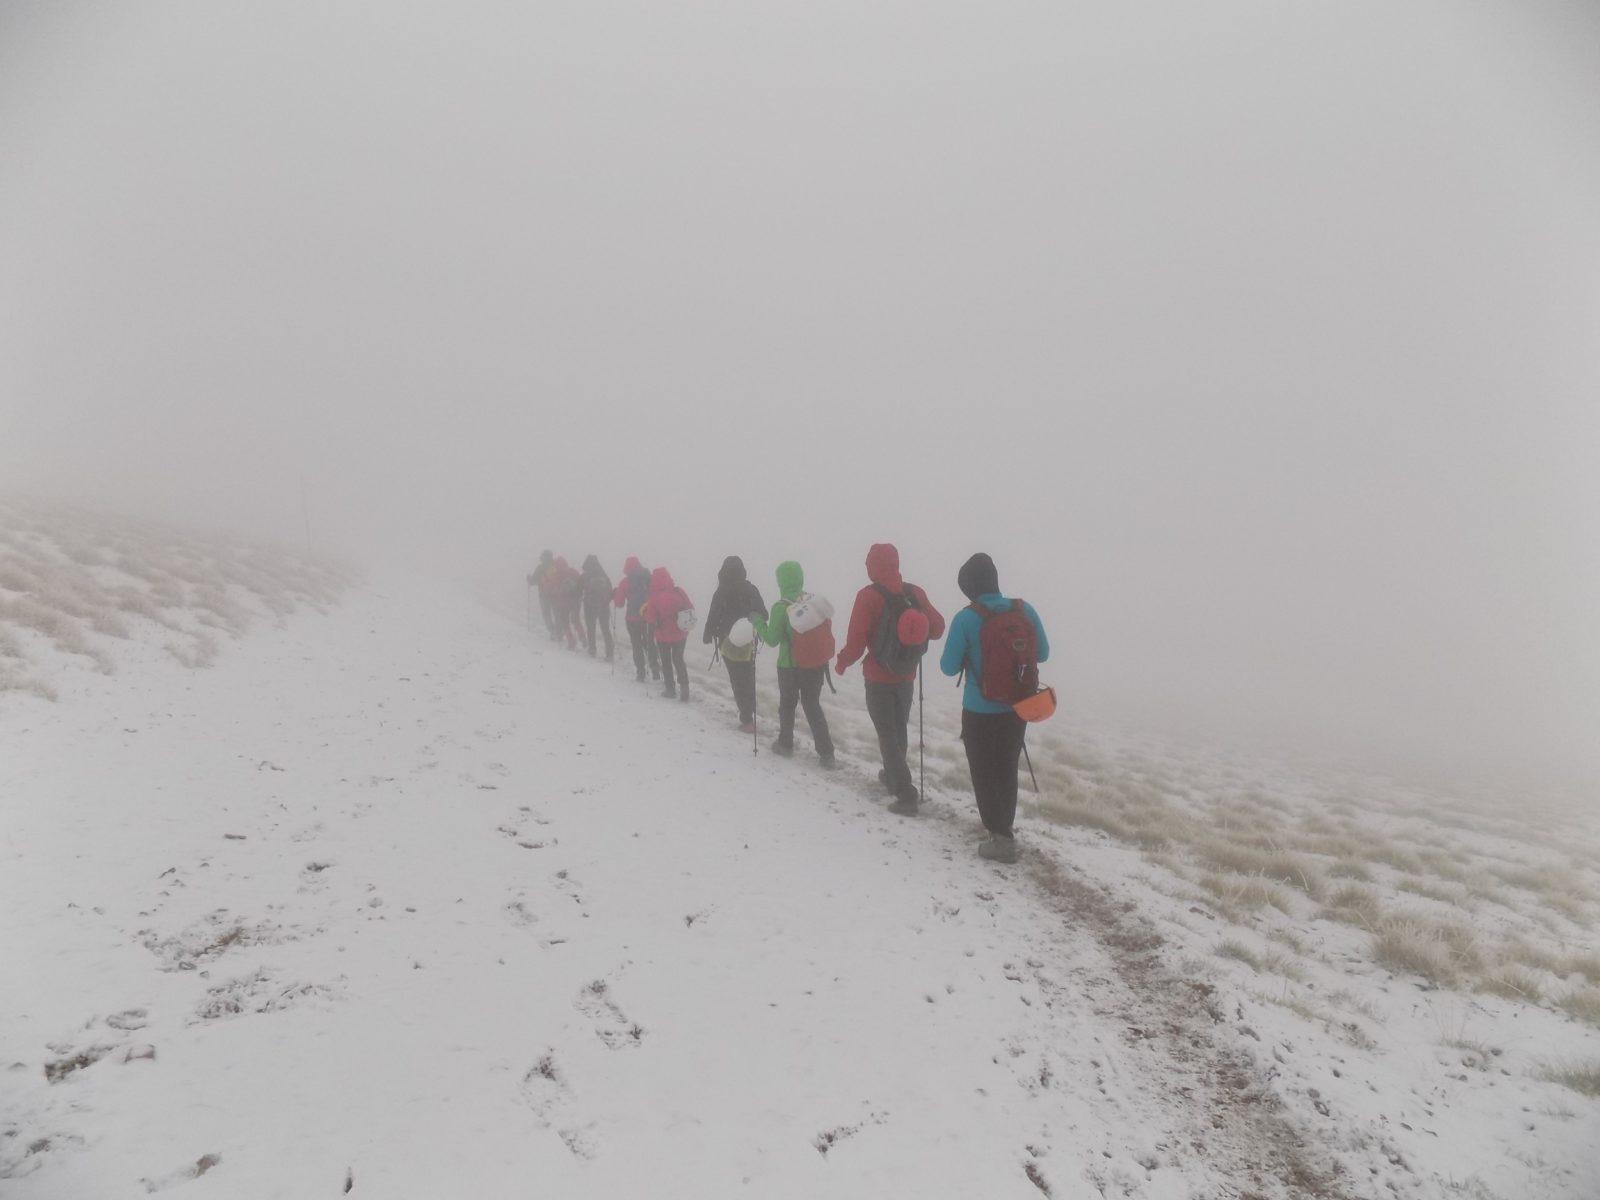 Olimp i planinari u magli